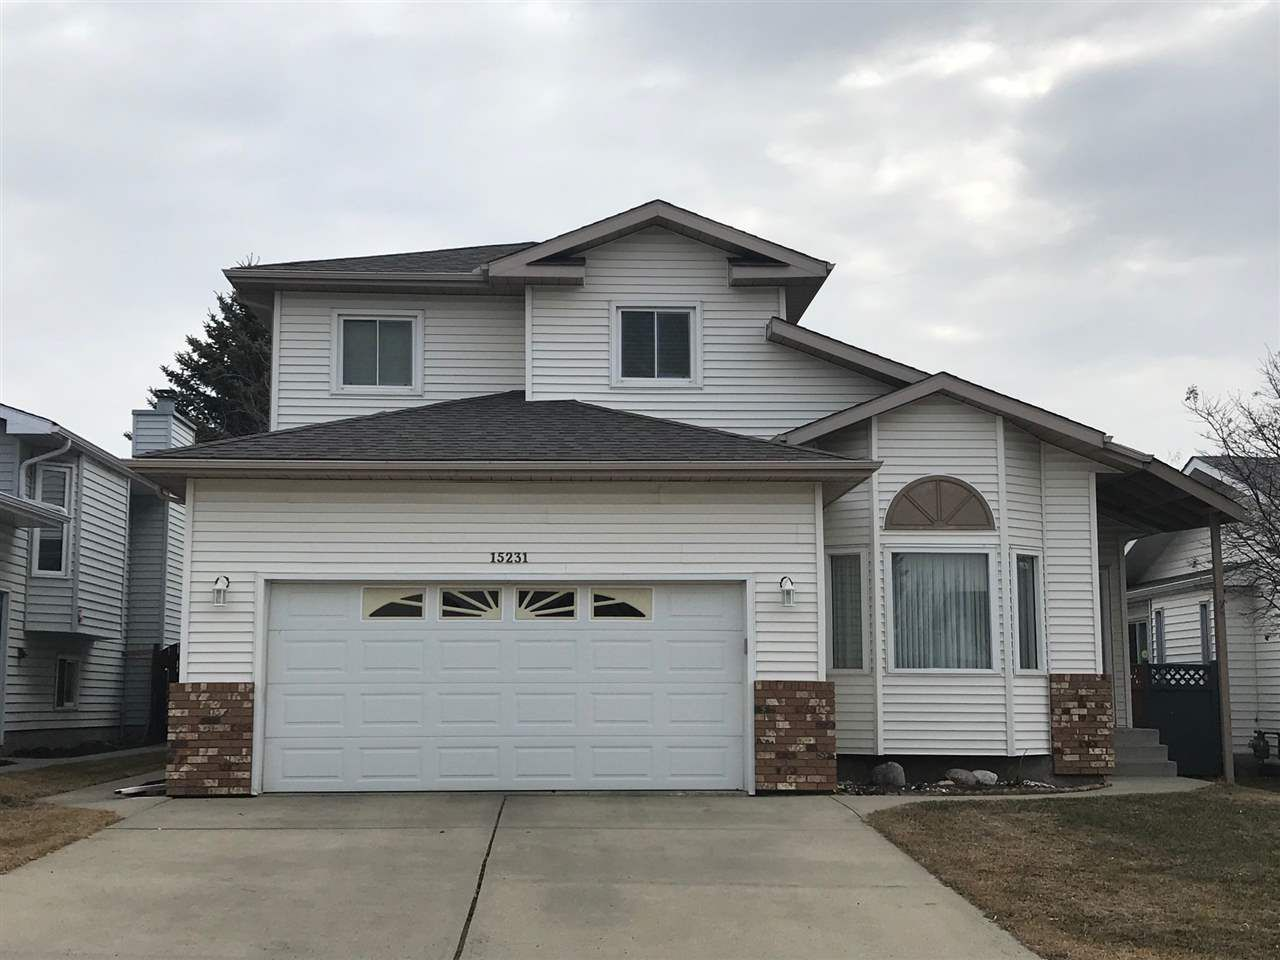 Main Photo: 15231 64 Street in Edmonton: Zone 02 House for sale : MLS®# E4150767